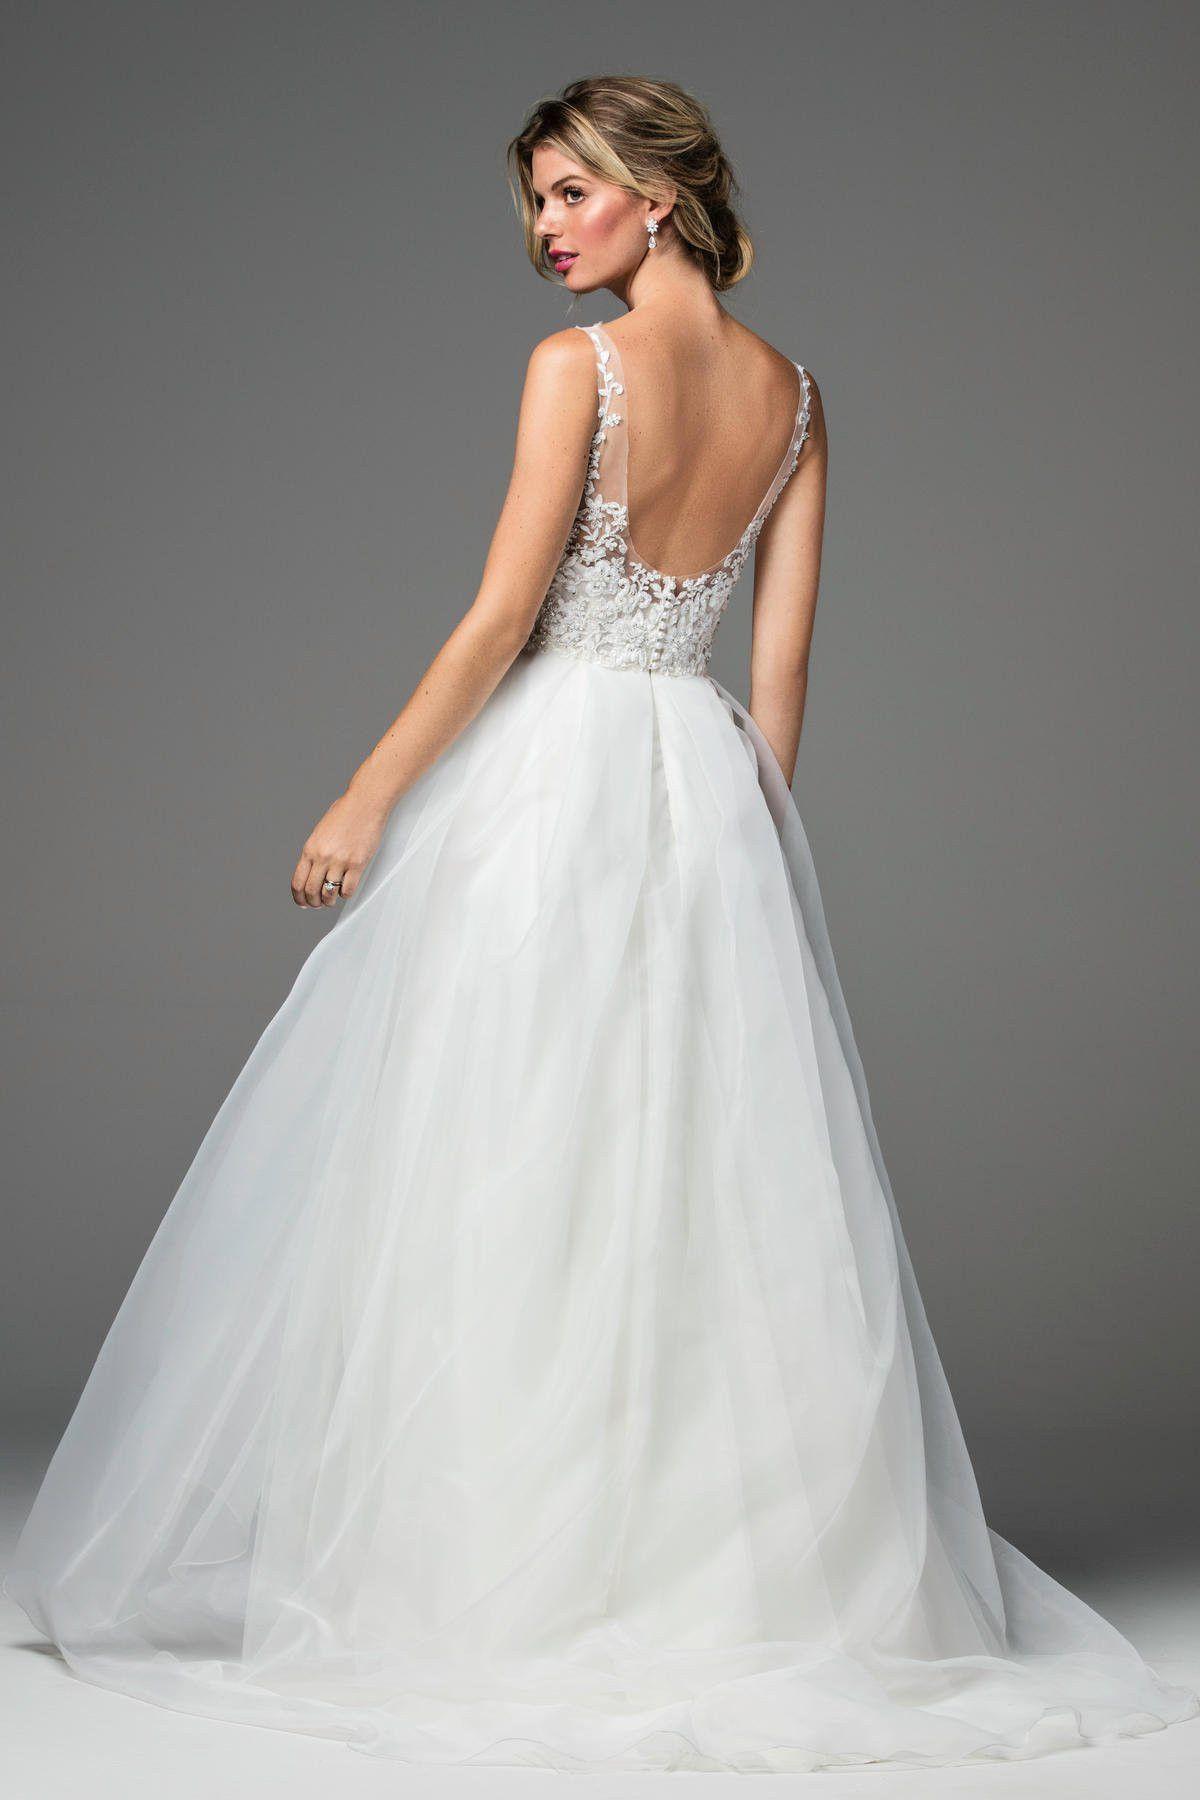 Wtoo sasha in products pinterest wedding dresses